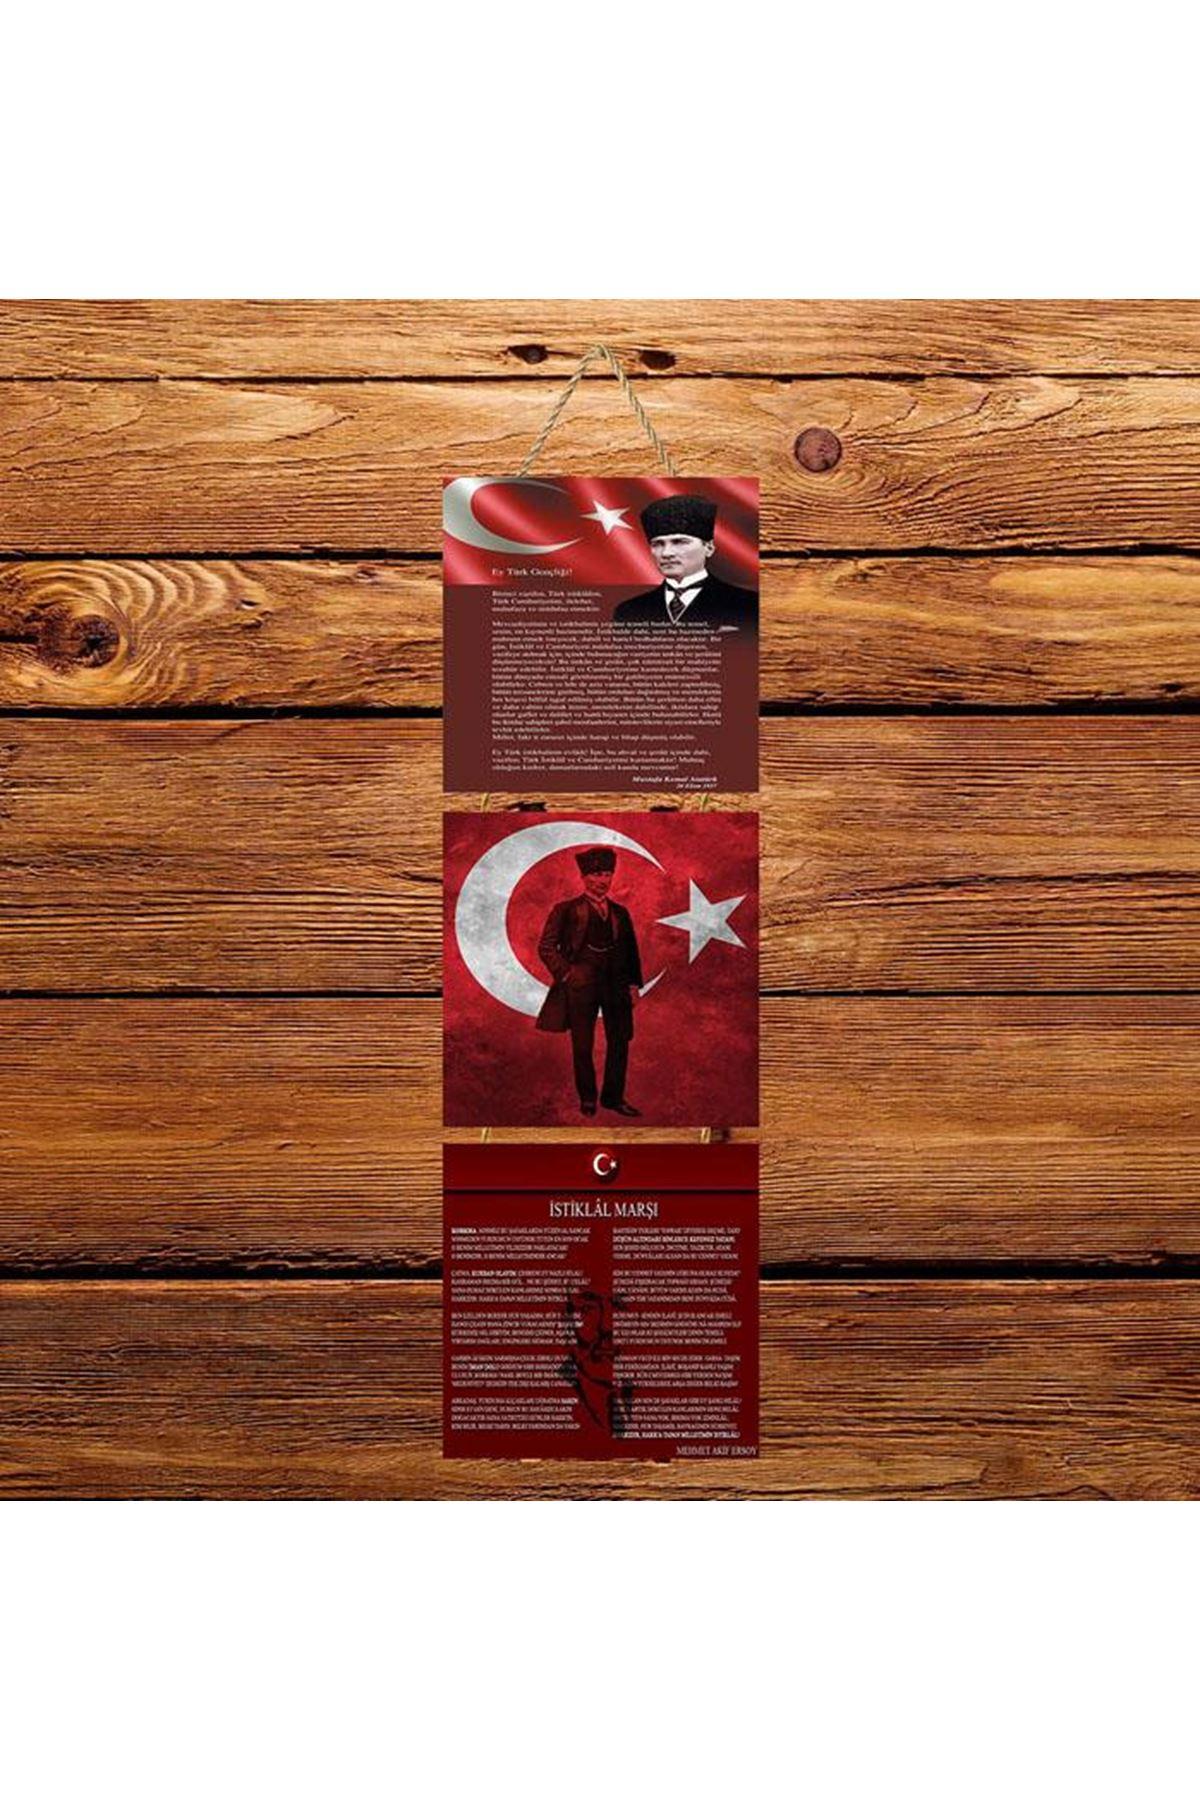 Atatürk İstiklal Marşı Gençliğe Hitabe -  3'lü Kabartmasız Poster